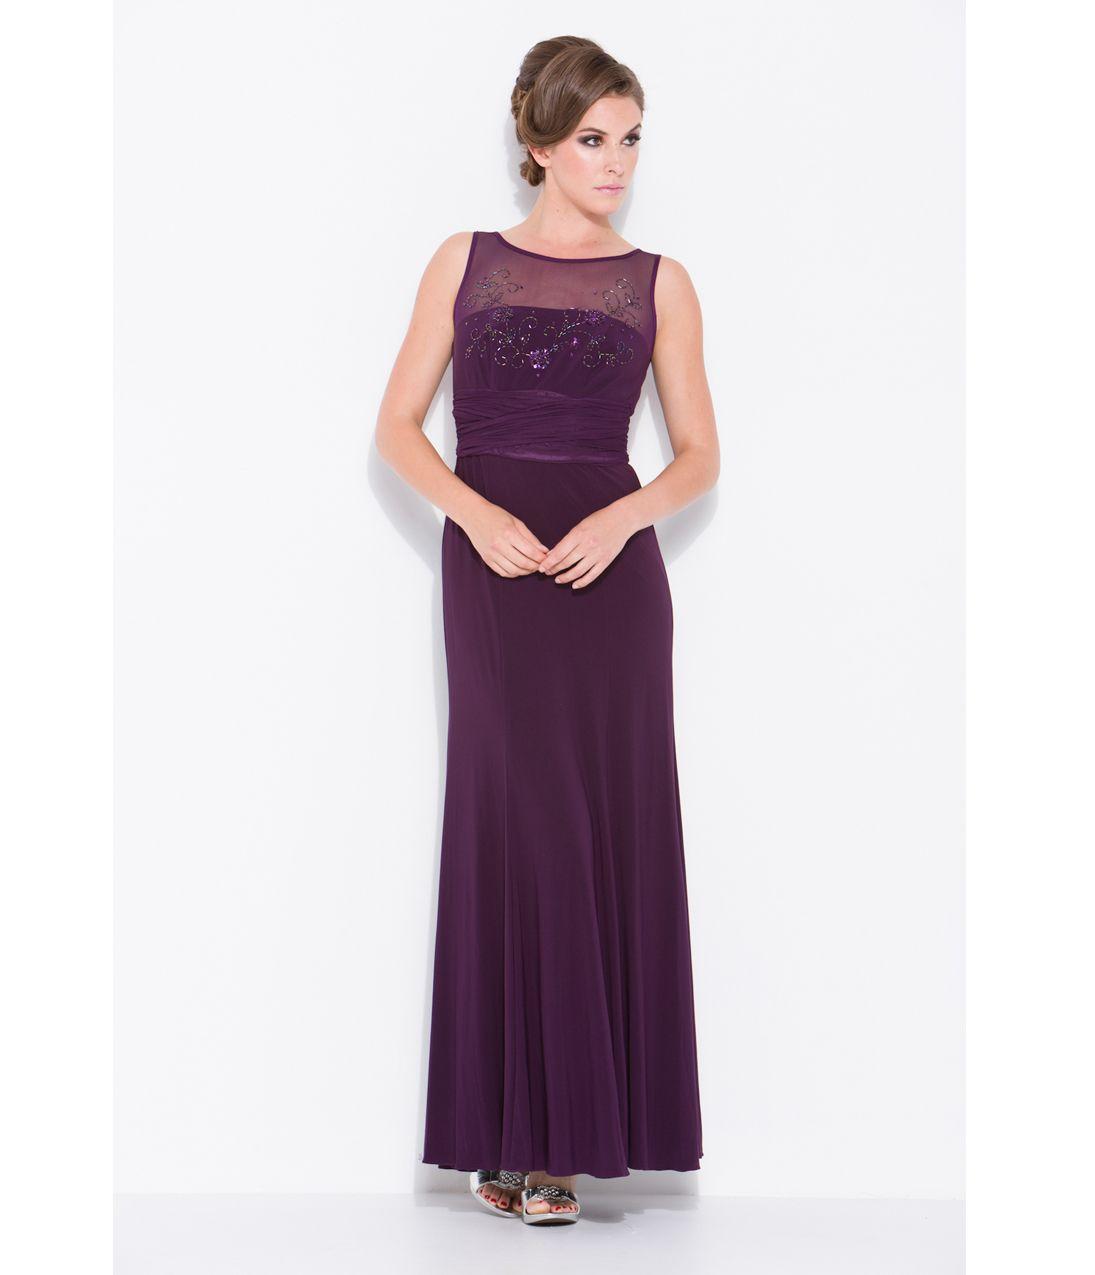 Plum Cocktail Dresses